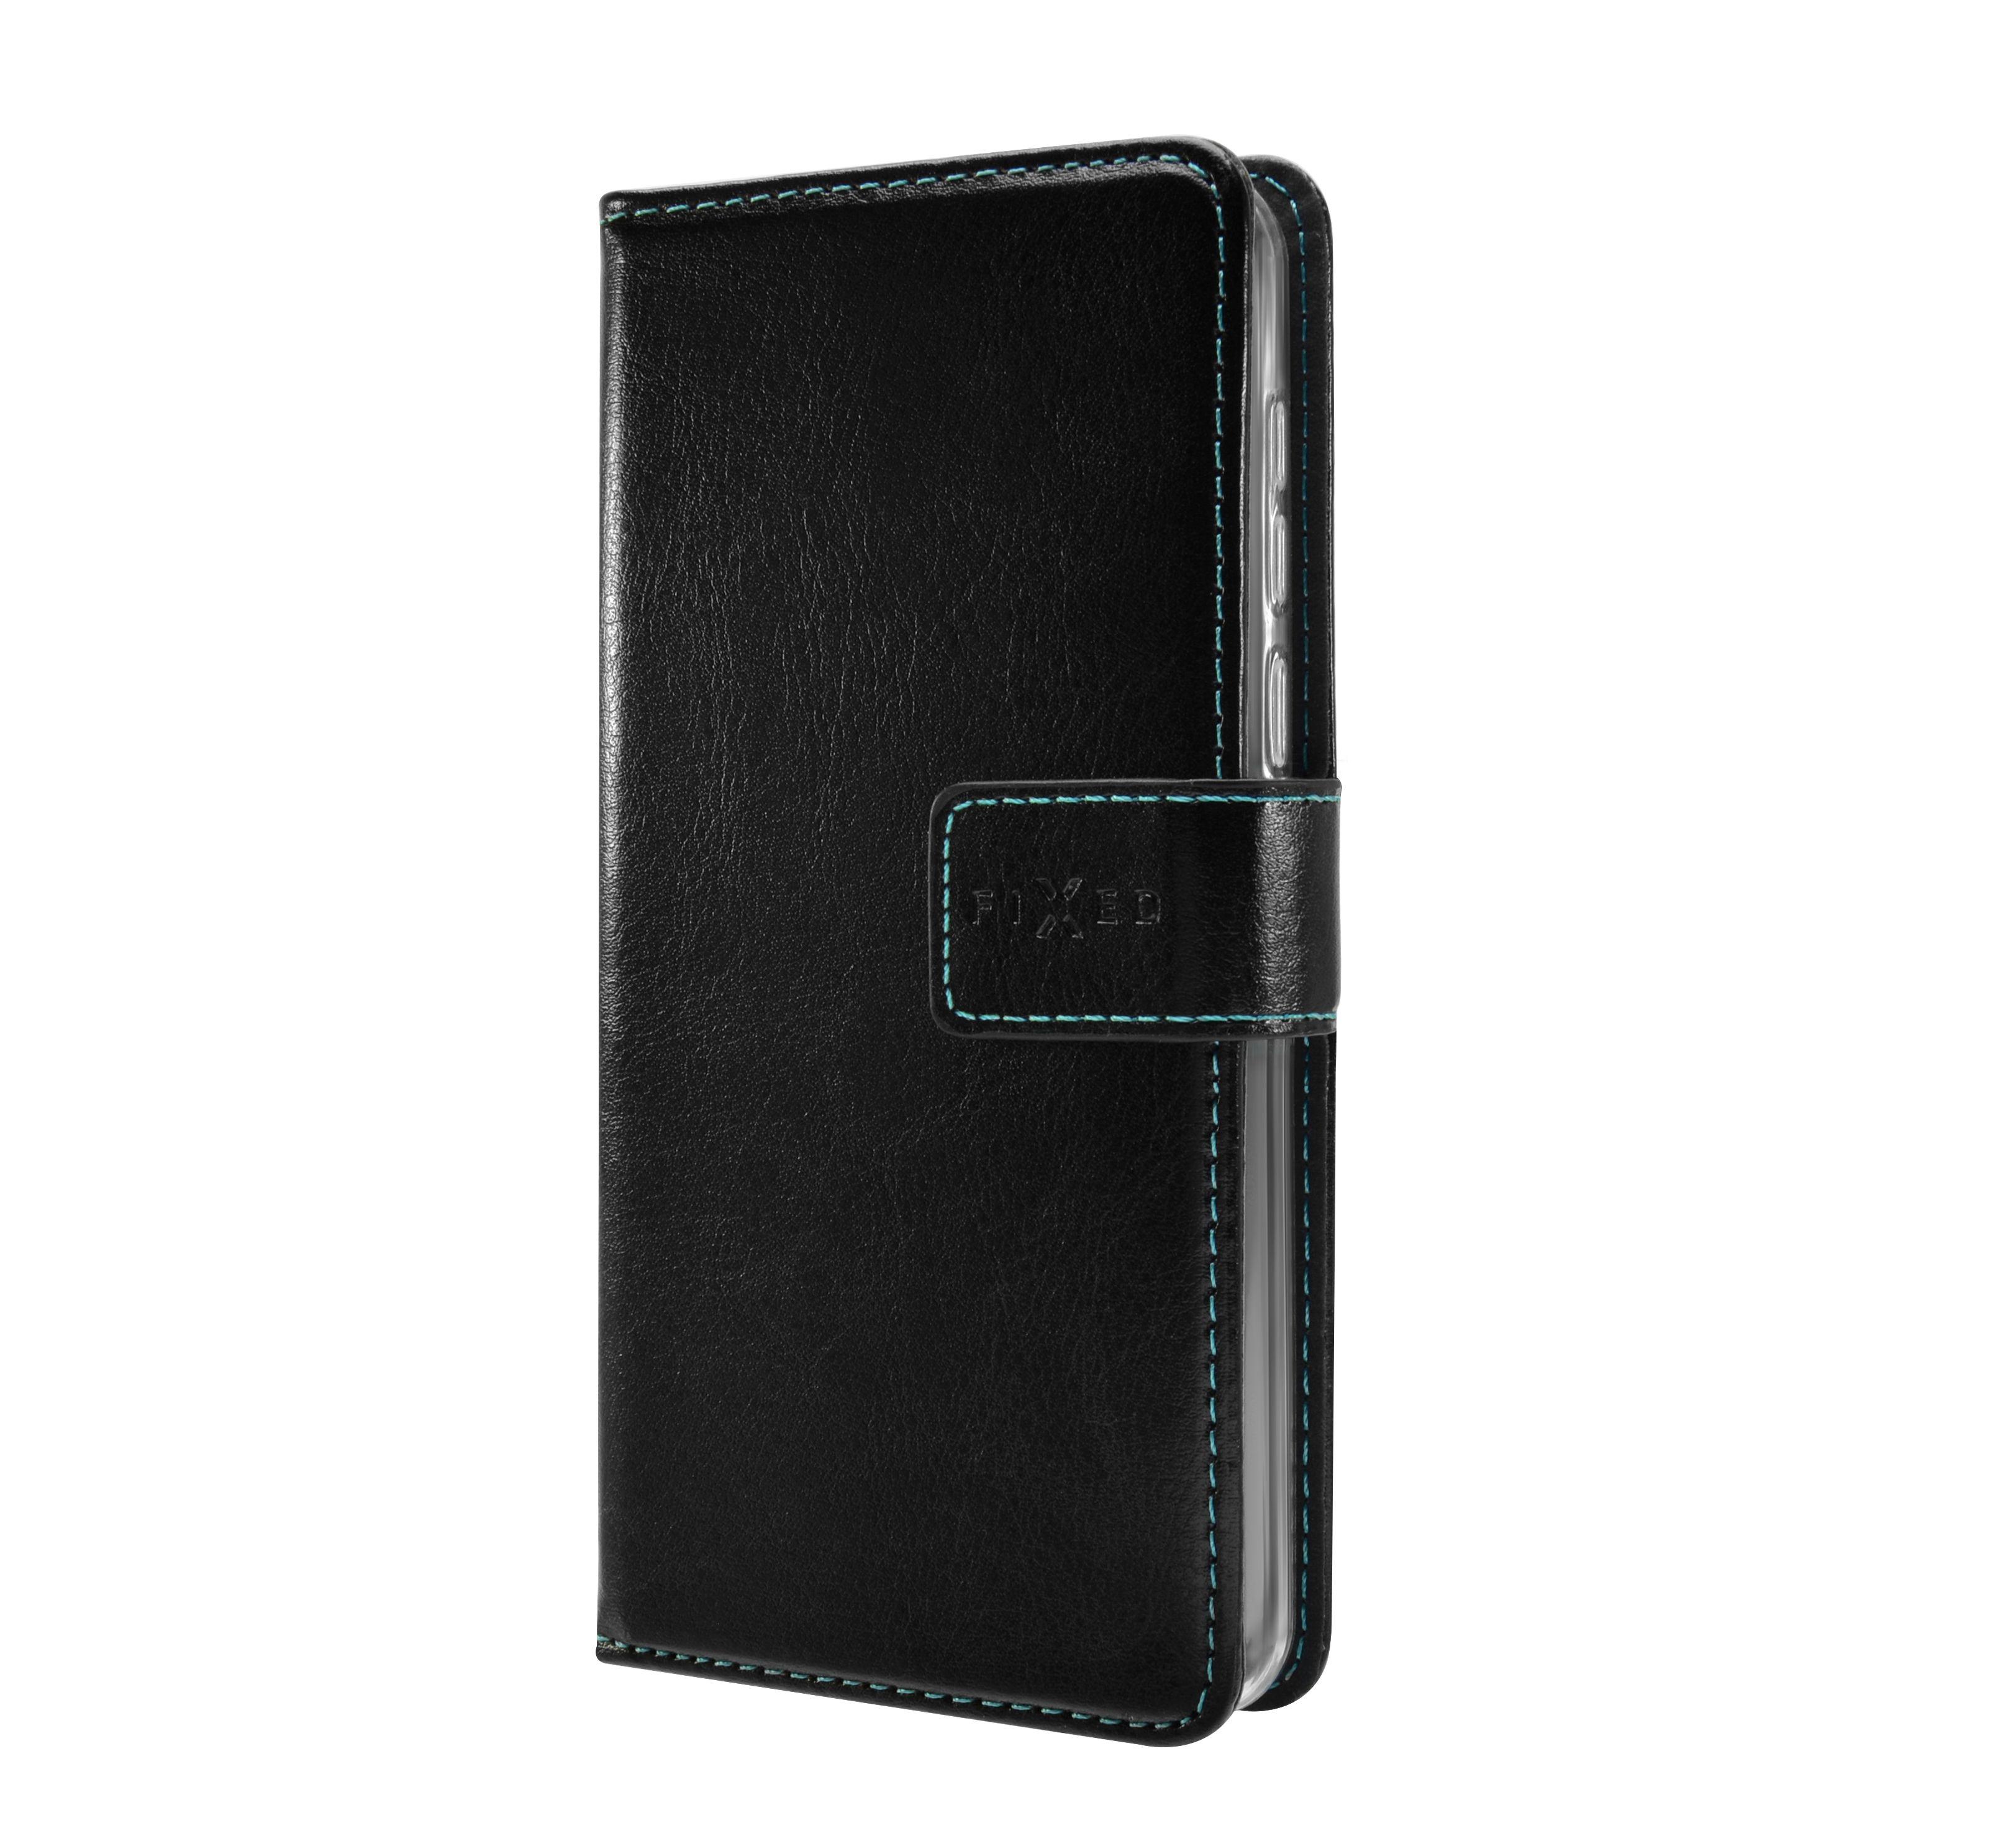 Pouzdro typu kniha FIXED Opus pro Xiaomi Redmi Note 6 Pro, černé